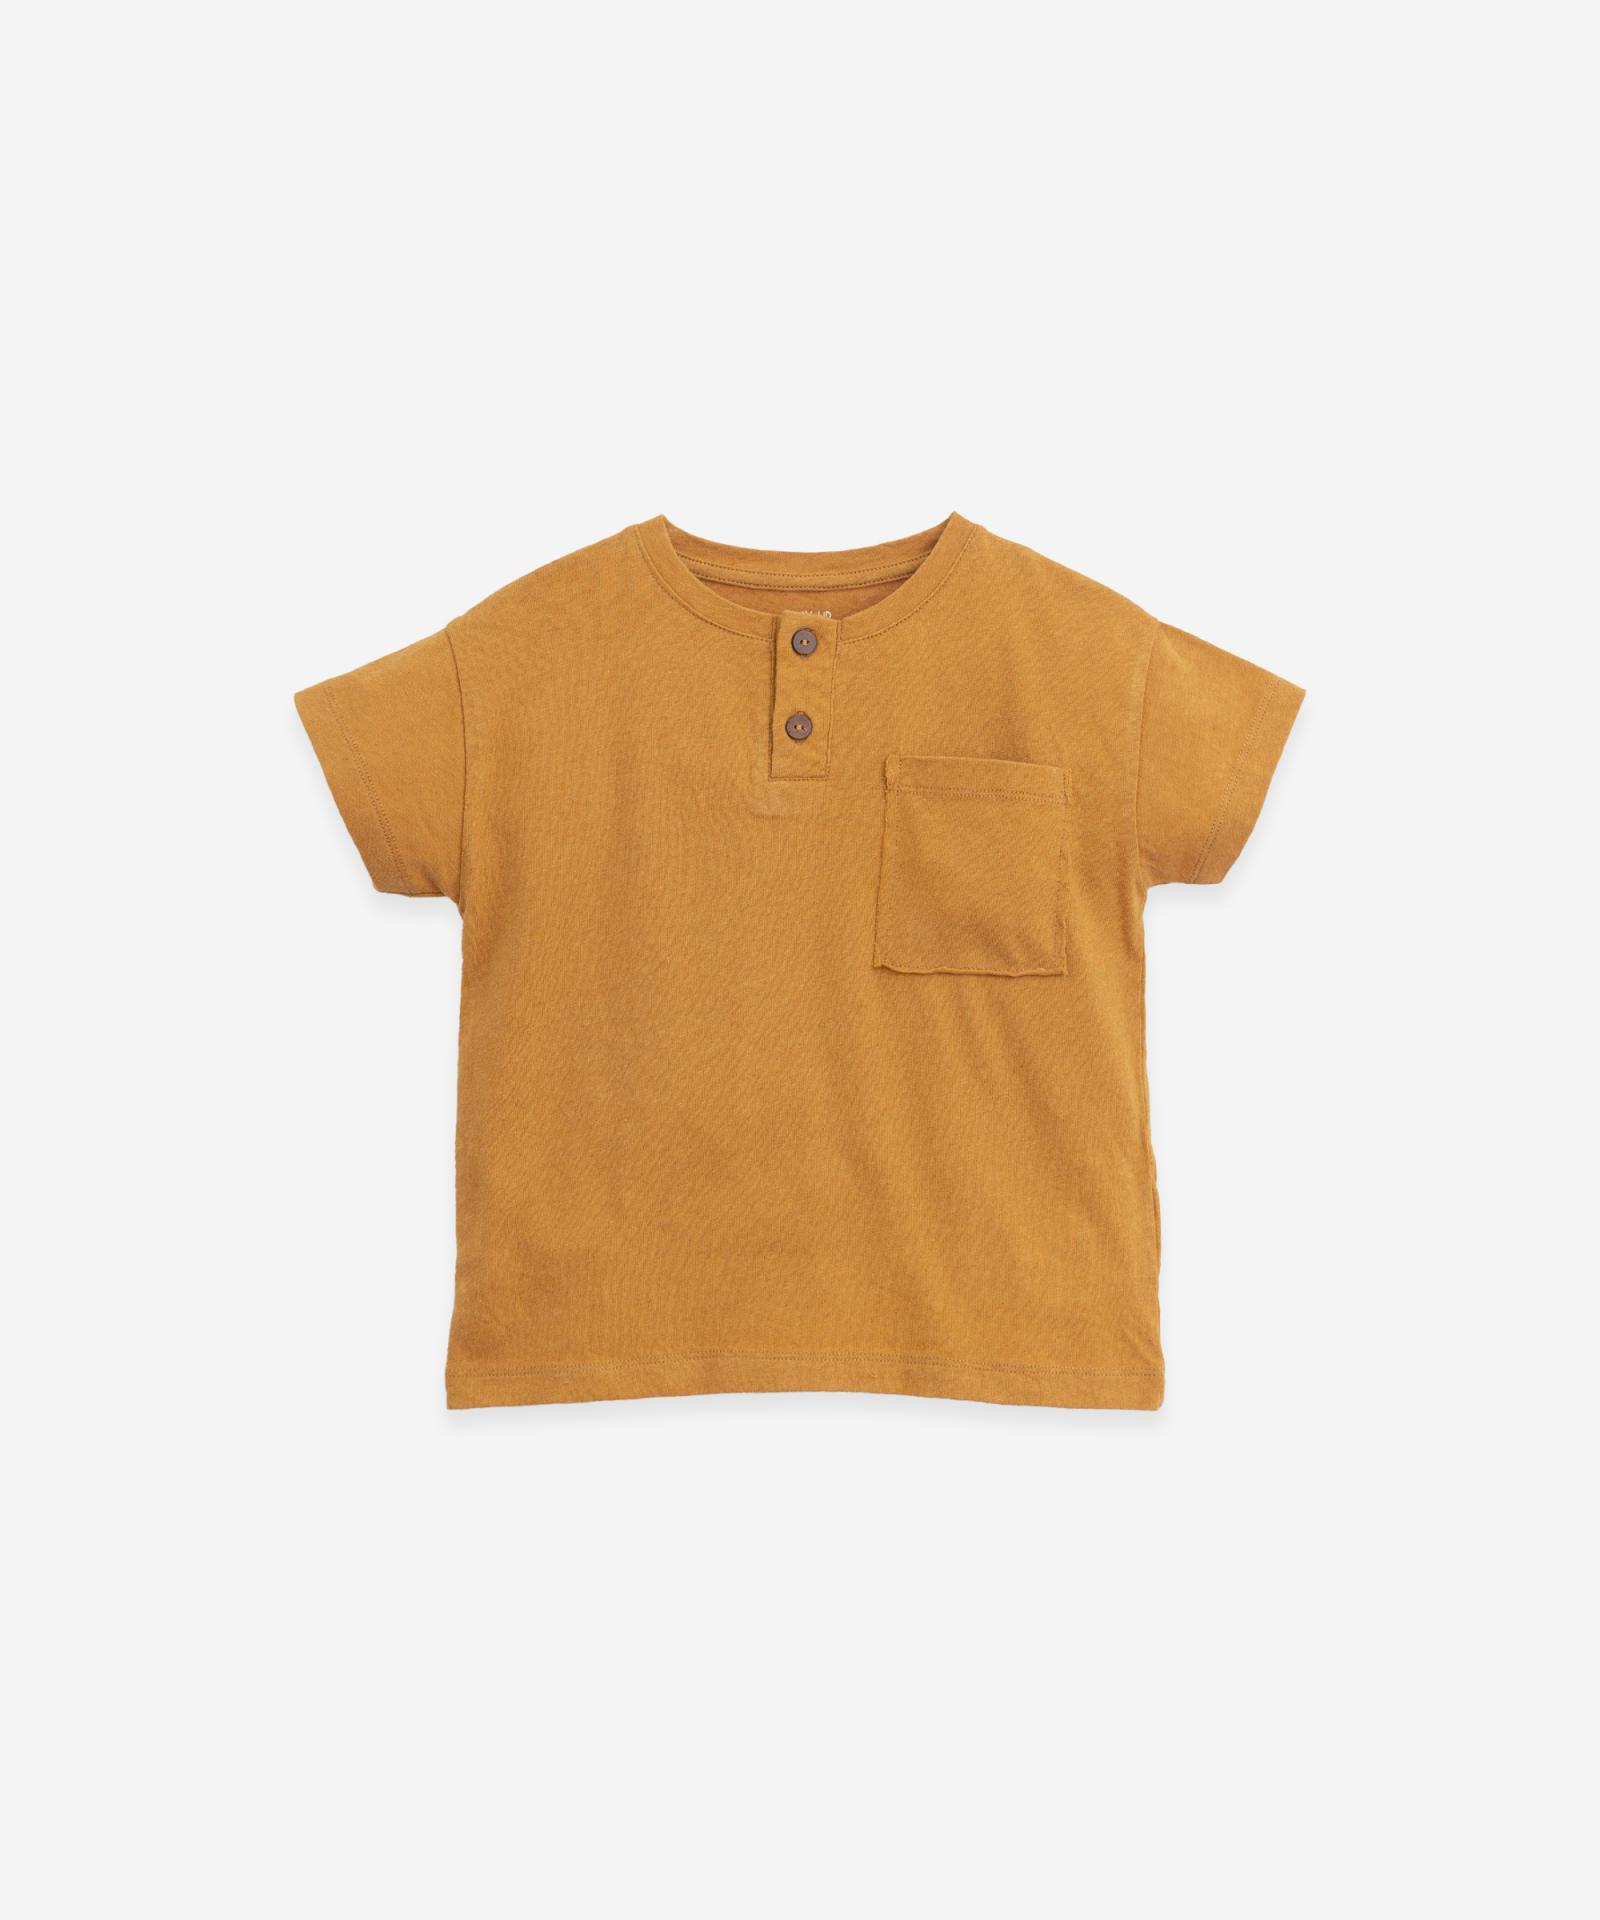 Camiseta Lino y Algodon Play Up